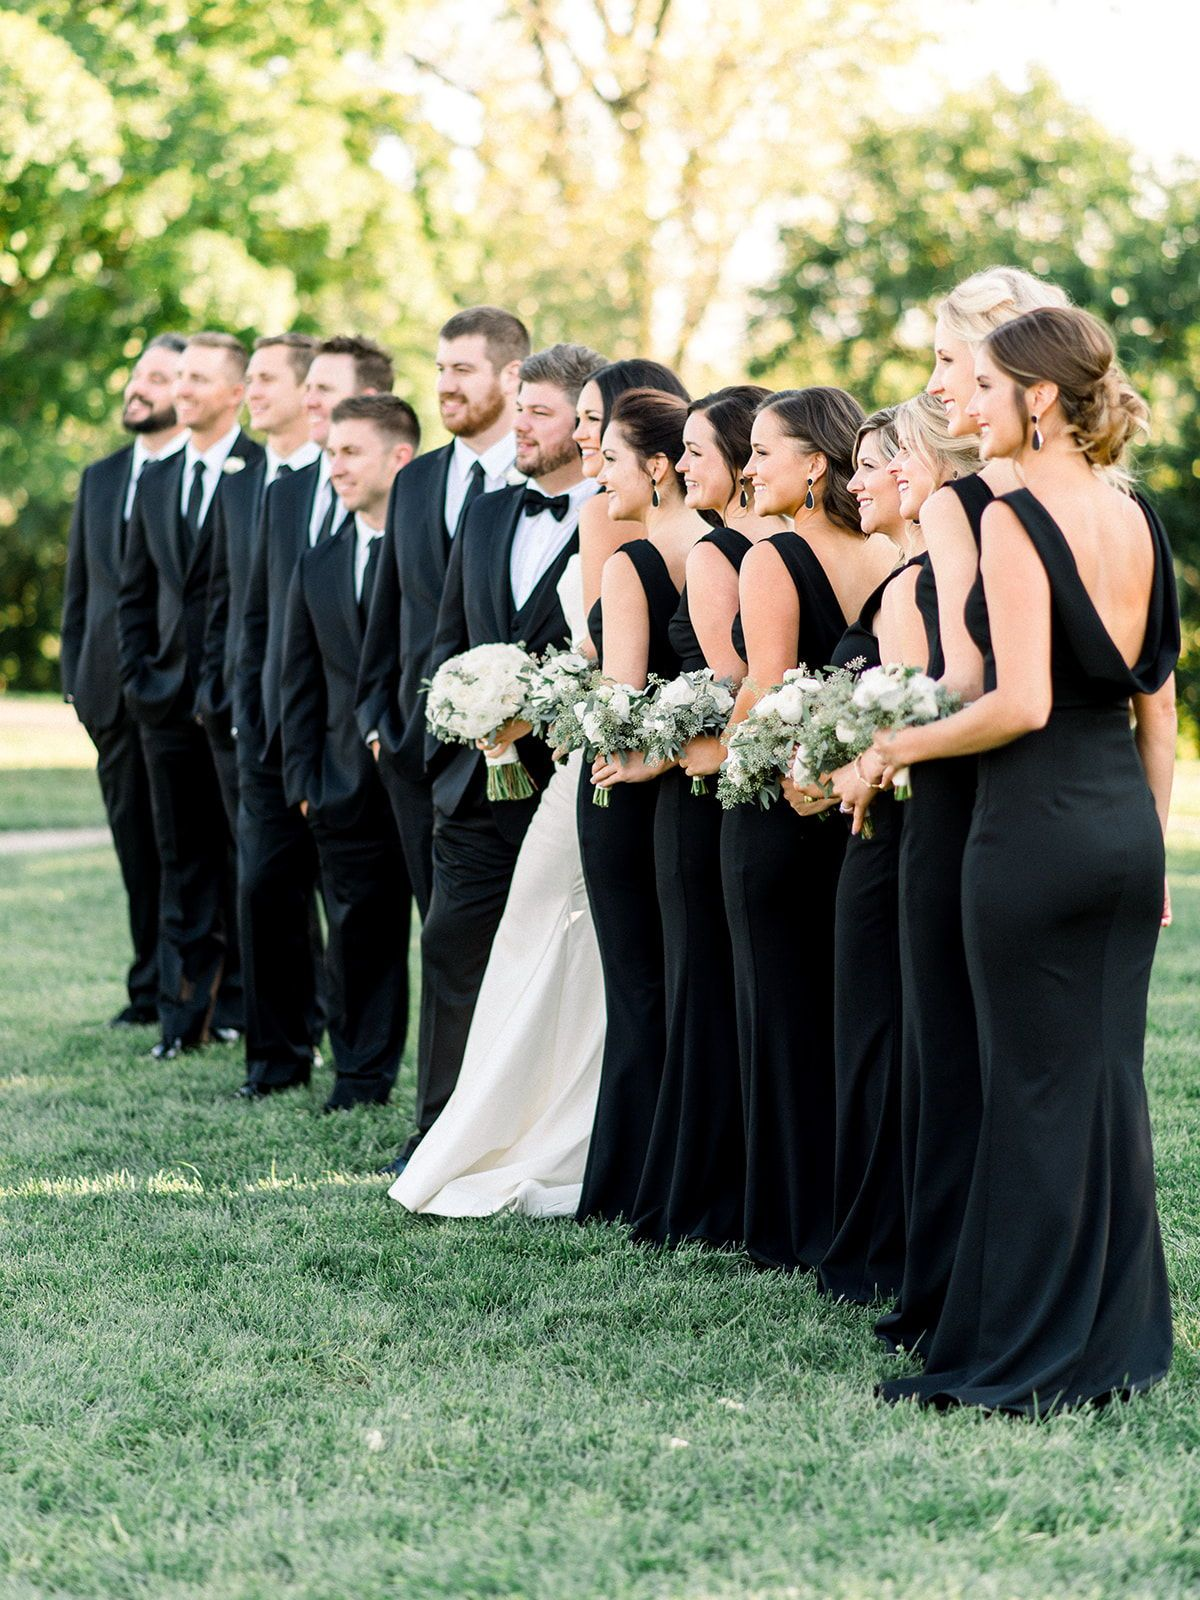 Wedding Party Photos Black And White Wedding Theme White Wedding Theme Black Bridal Parties [ 1600 x 1200 Pixel ]